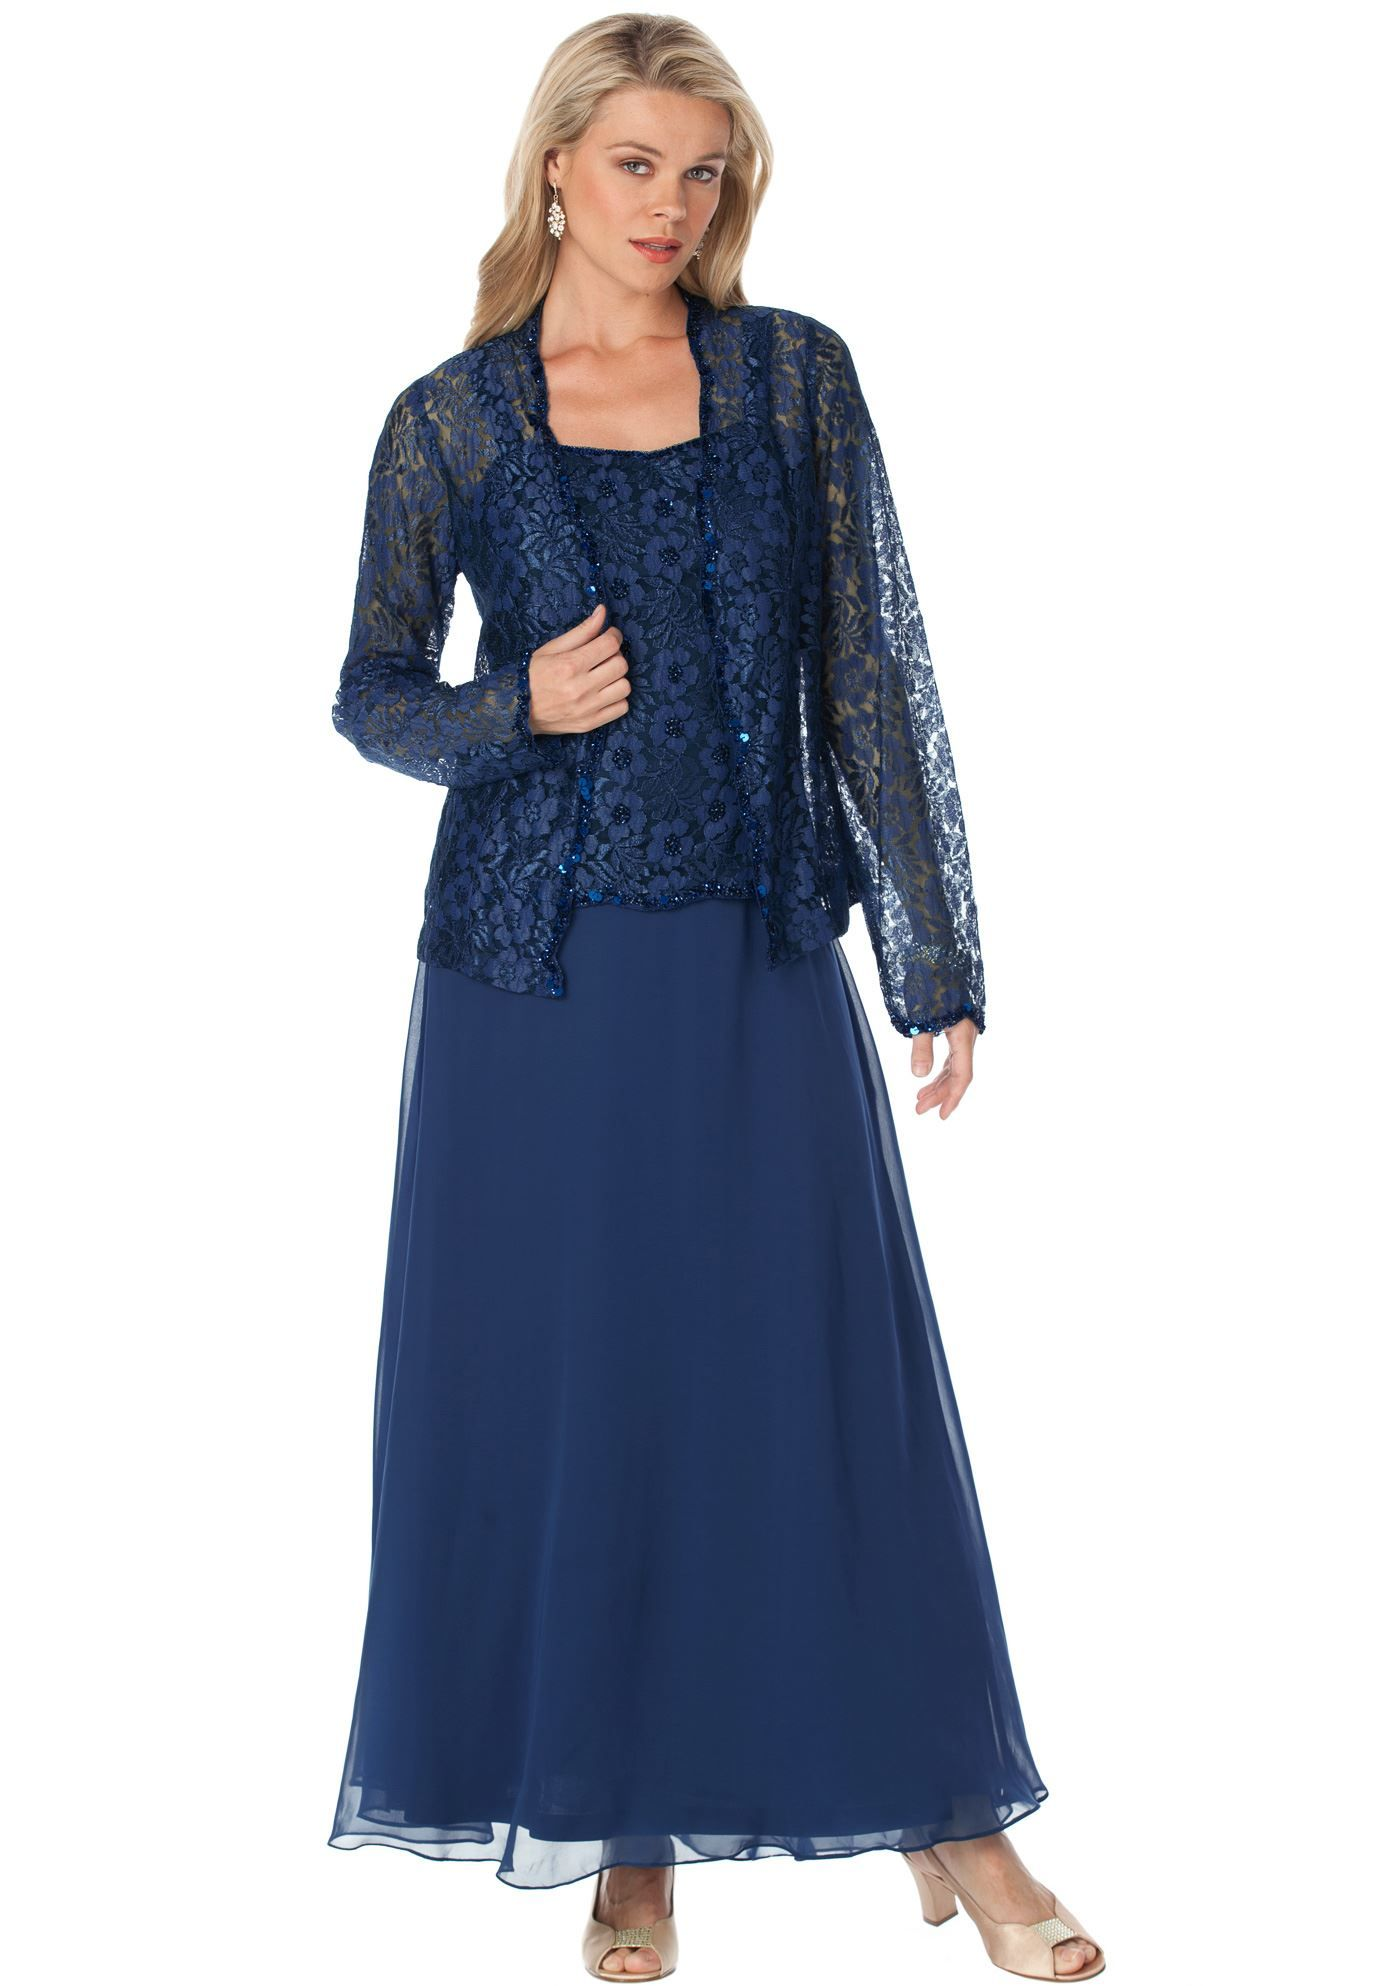 Roaman's® Beaded Lace Jacket Dress | Plus Size Evening Dresses ...